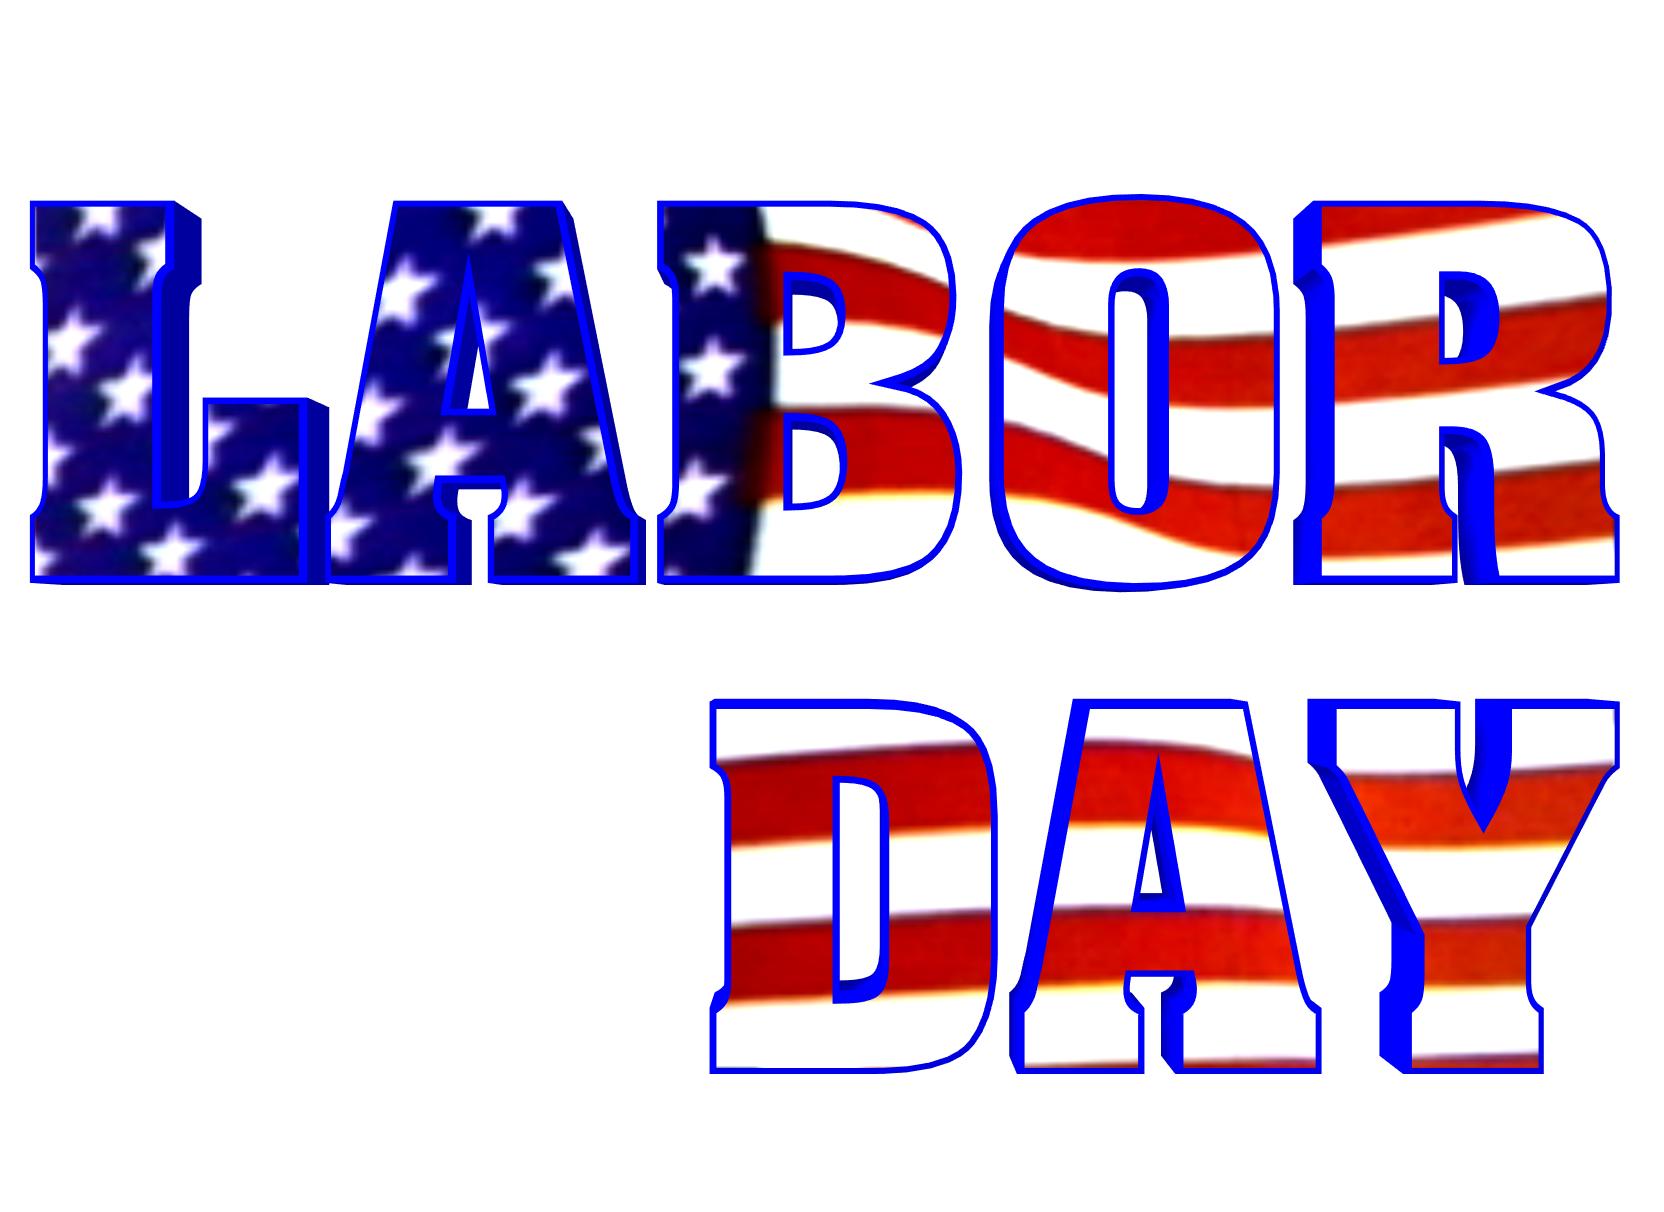 1664x1212 Animation Labor Day Clipart Border Labor Day Clipart Border